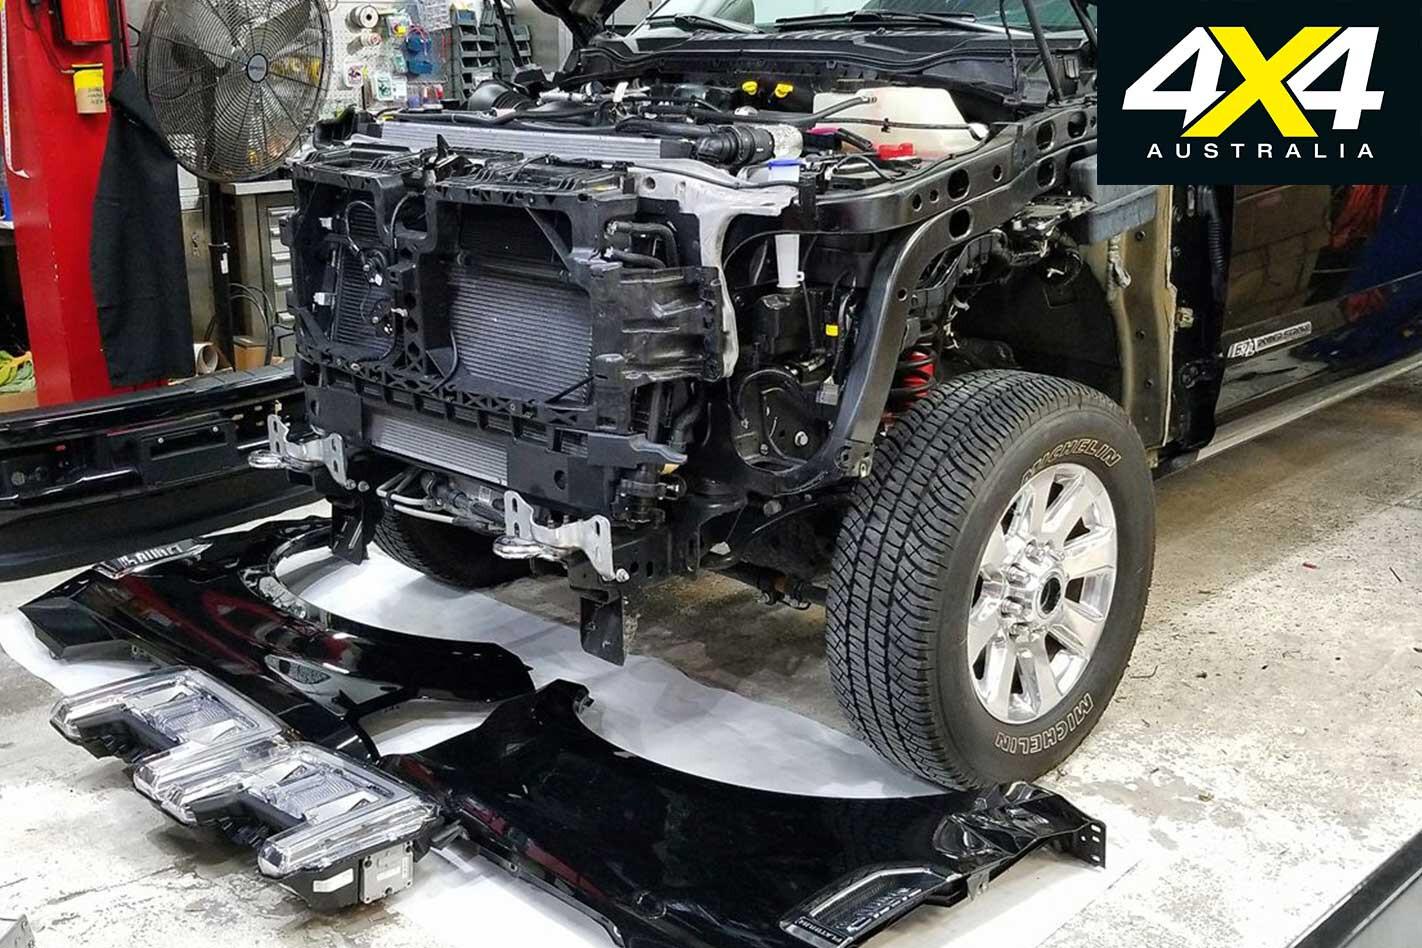 Ford F 250 Post Apocalyptic Treatment Bodykit Installation Jpg